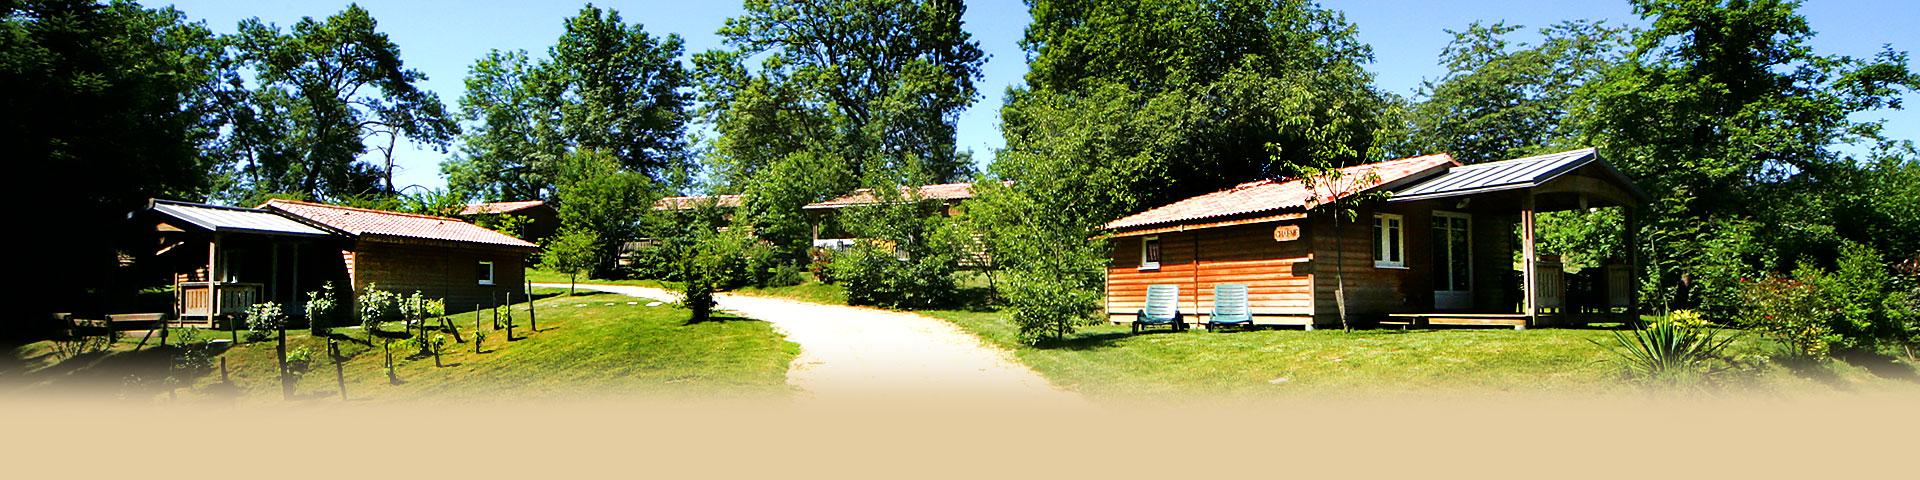 sandaux-village-slide-1